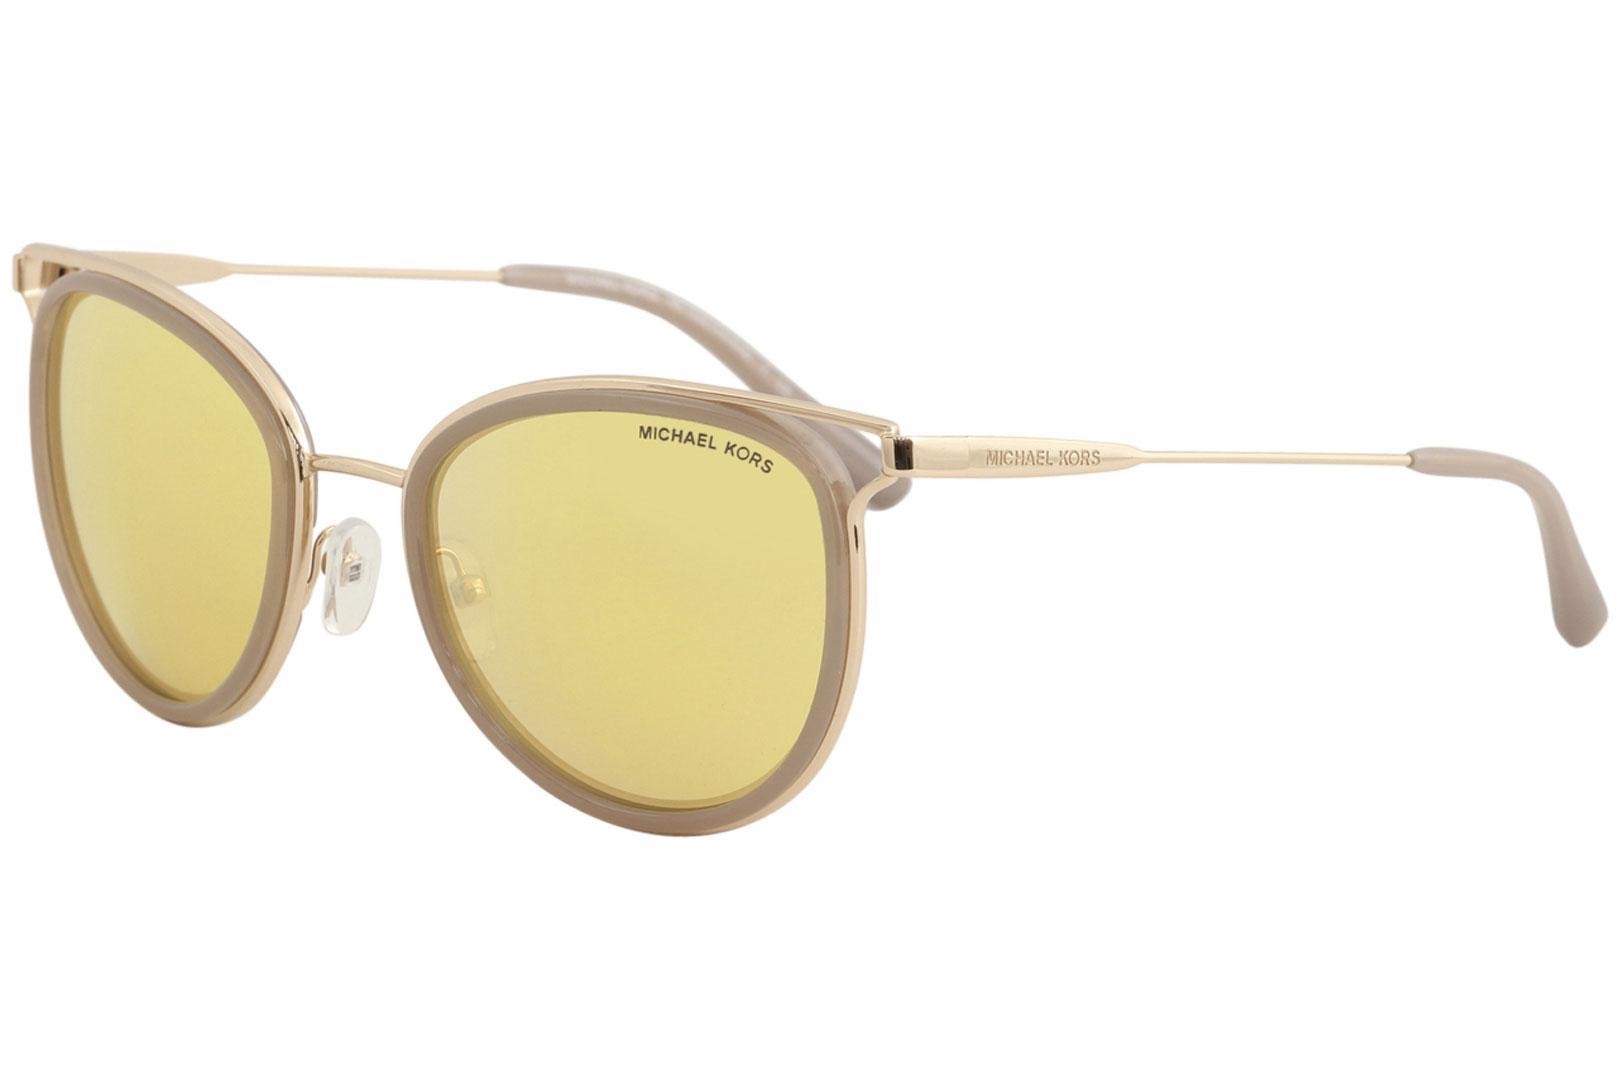 a02b8ba3c4 Michael Kors Women s Havana MK1025 MK 1025 Fashion Round Sunglasses